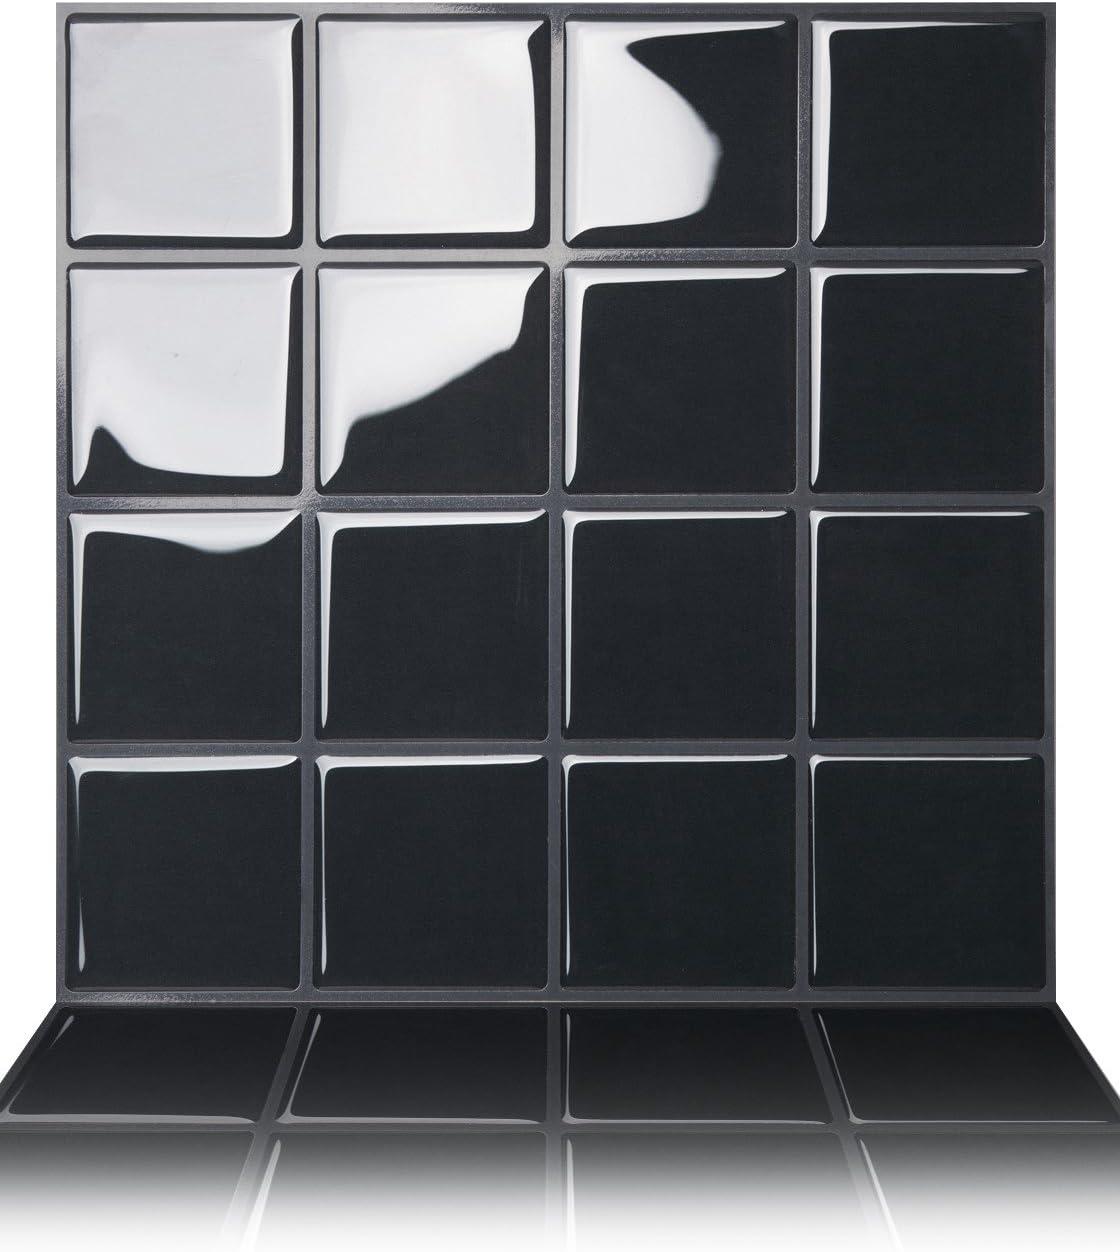 Tic Tac Tiles 5-Sheet Peel and Stick Self Adhesive Removable Stick On Kitchen Backsplash Bathroom 3D Wall Sticker Wallpaper Tiles in Big Square Dark Grey